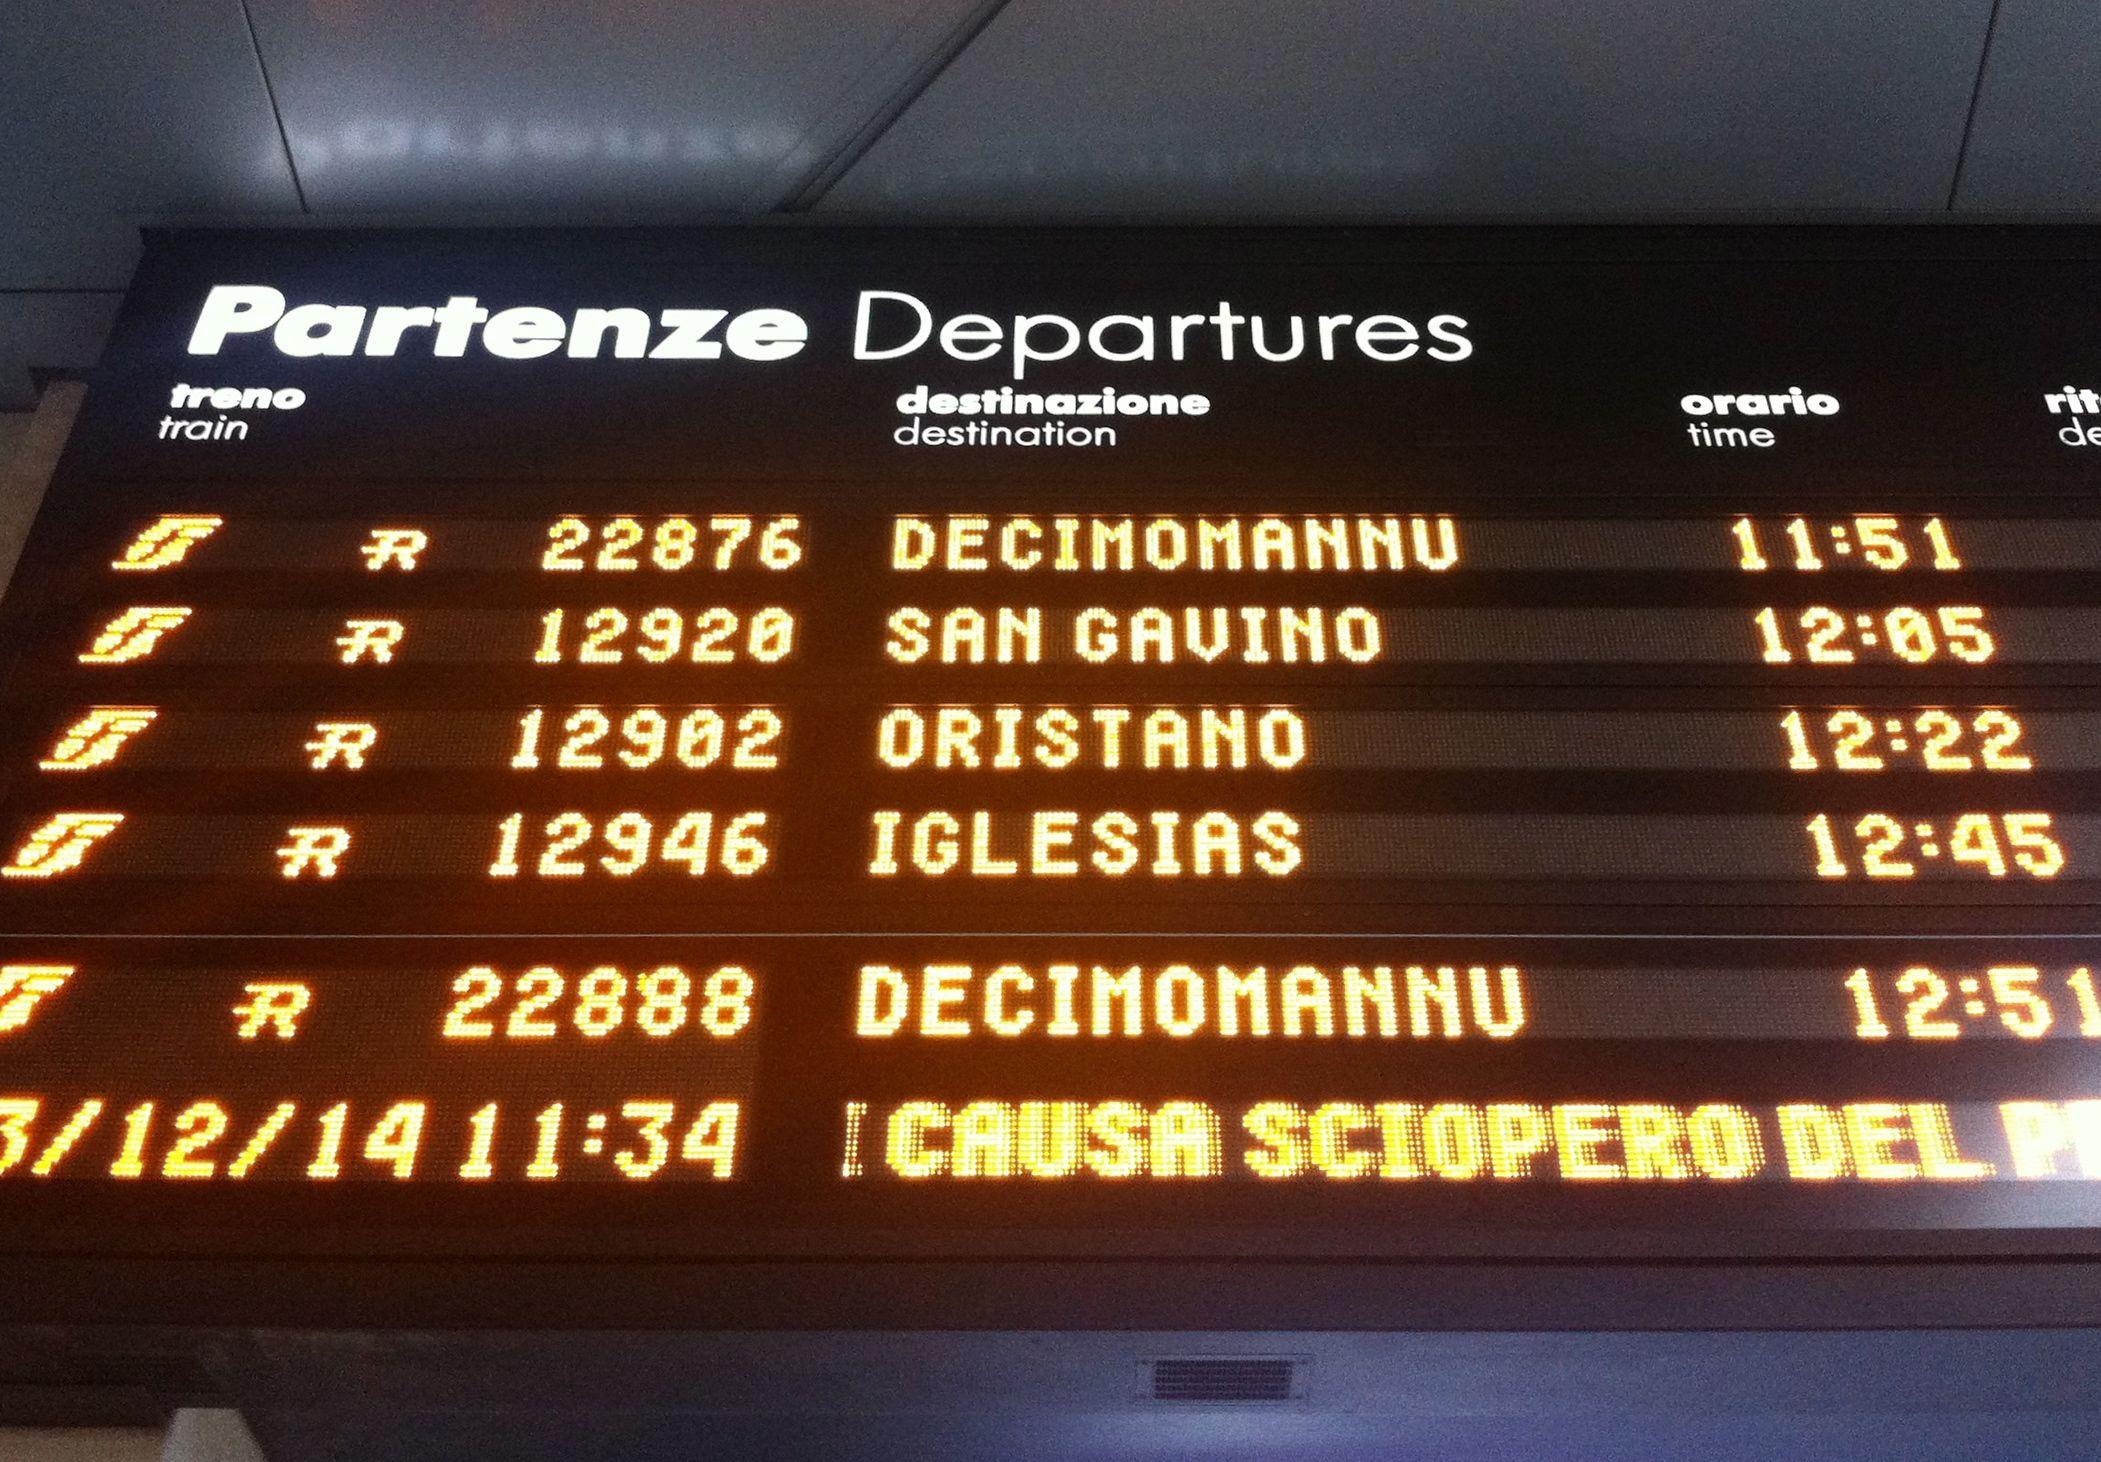 Sardegna 2015: ora o mai più. Per Pigliaru, Zedda e i sovranisti un anno cruciale